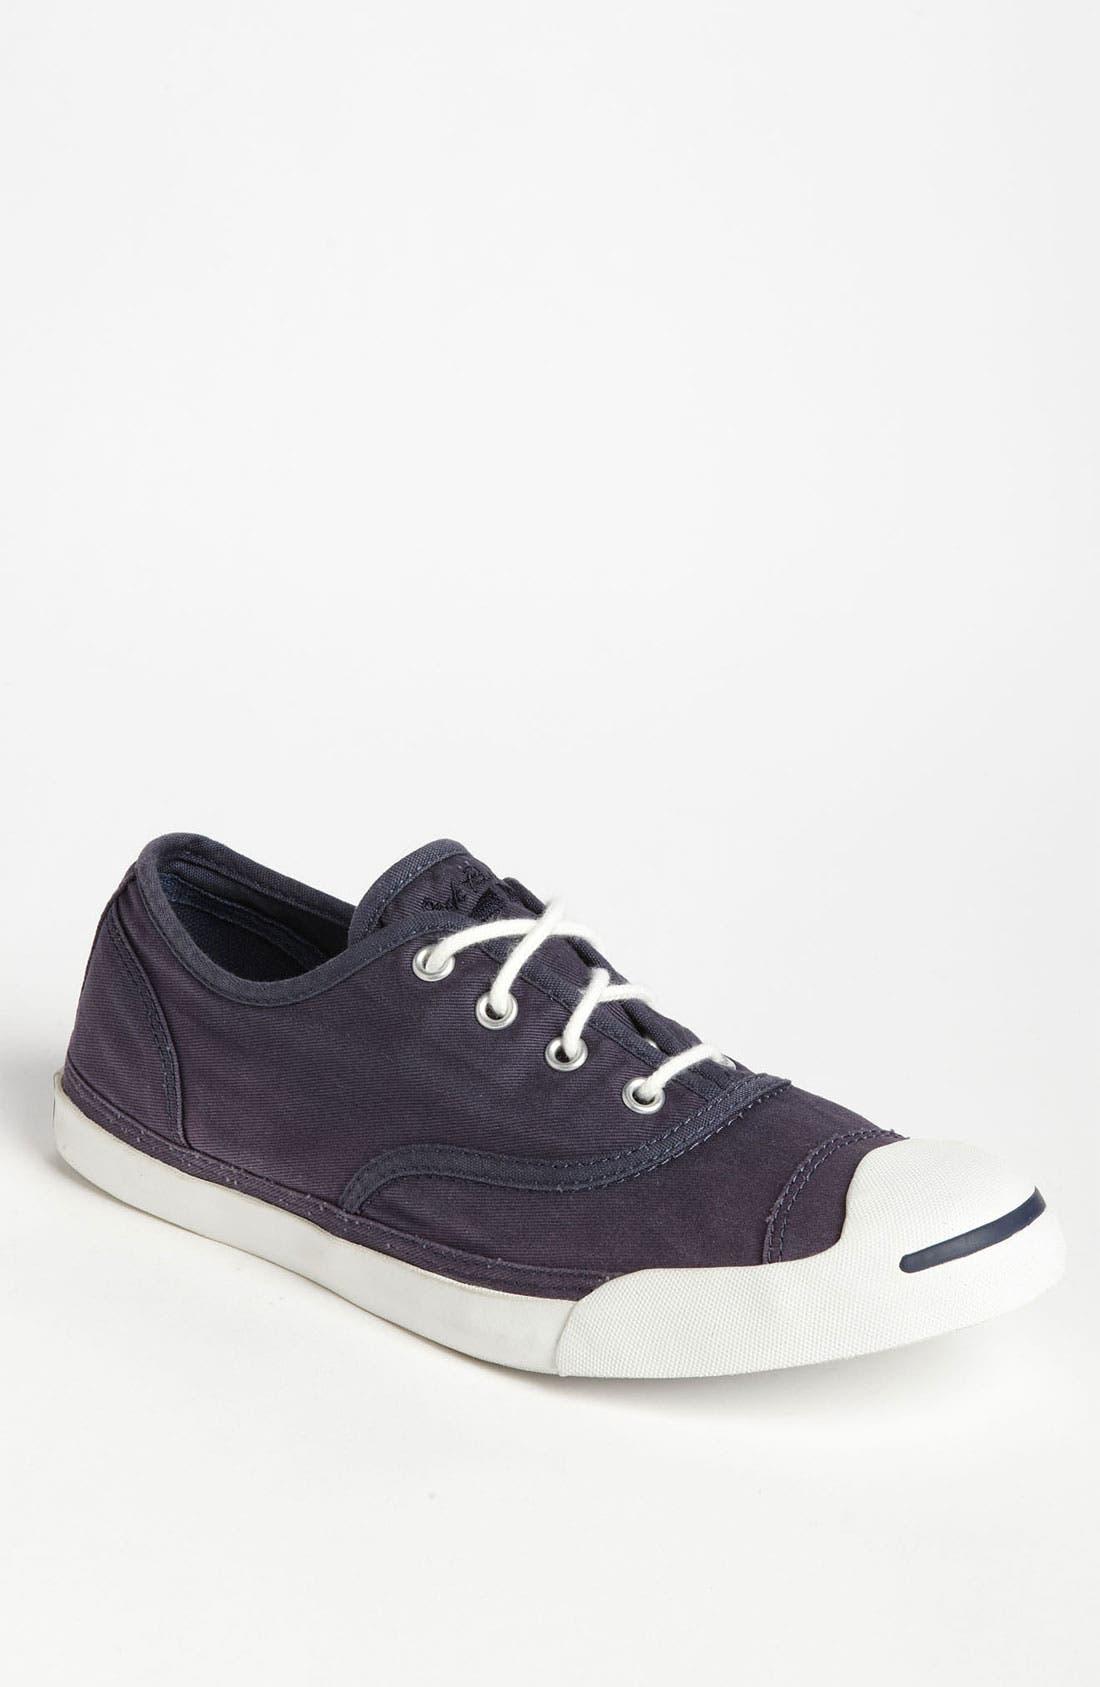 Alternate Image 1 Selected - Converse 'Jack Purcell CVO LP' Sneaker (Men)